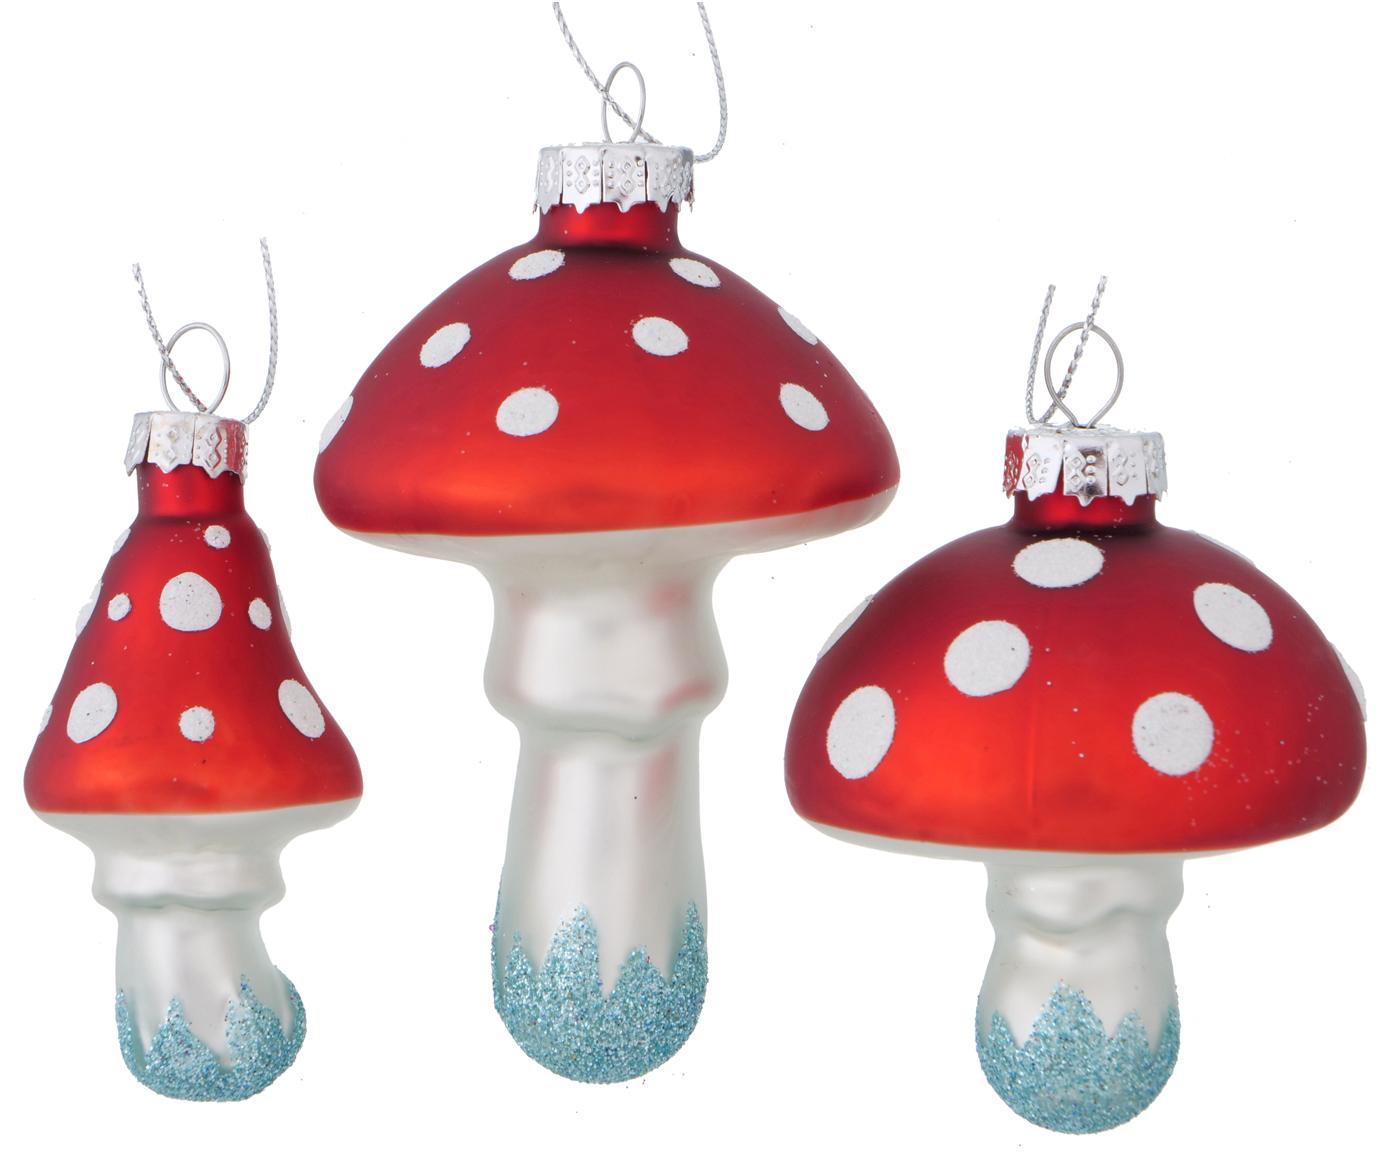 Set 3 ciondoli Minamo, Azzurro, bianco, rosso, Set in varie misure